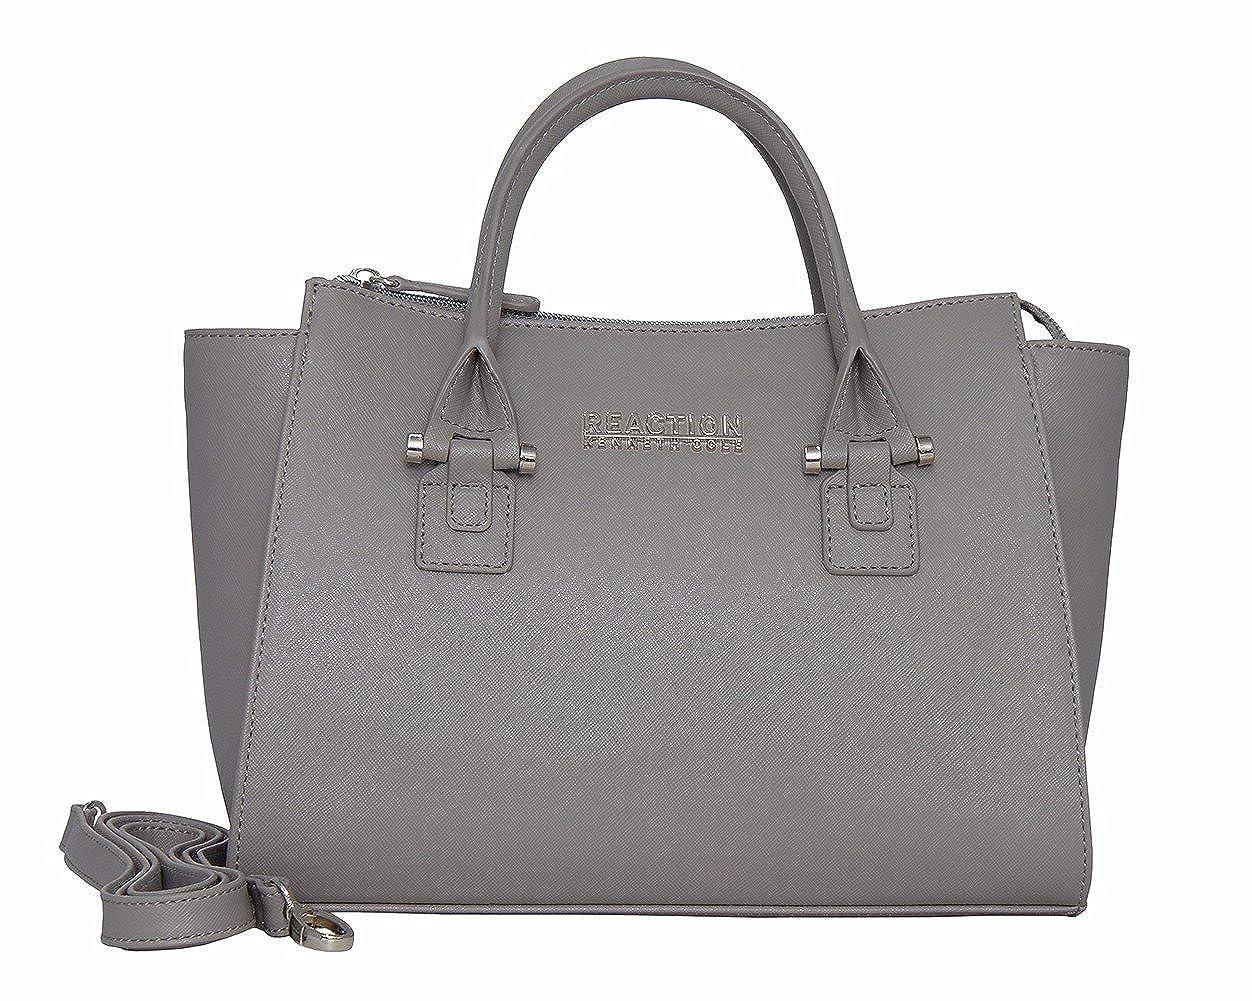 Amazon.com: Kenneth Cole Reaction KN1550 Magnolia Handbag Top Handle Messenger Crossbody Shoulder Bag (Stony Brook): Home & Kitchen